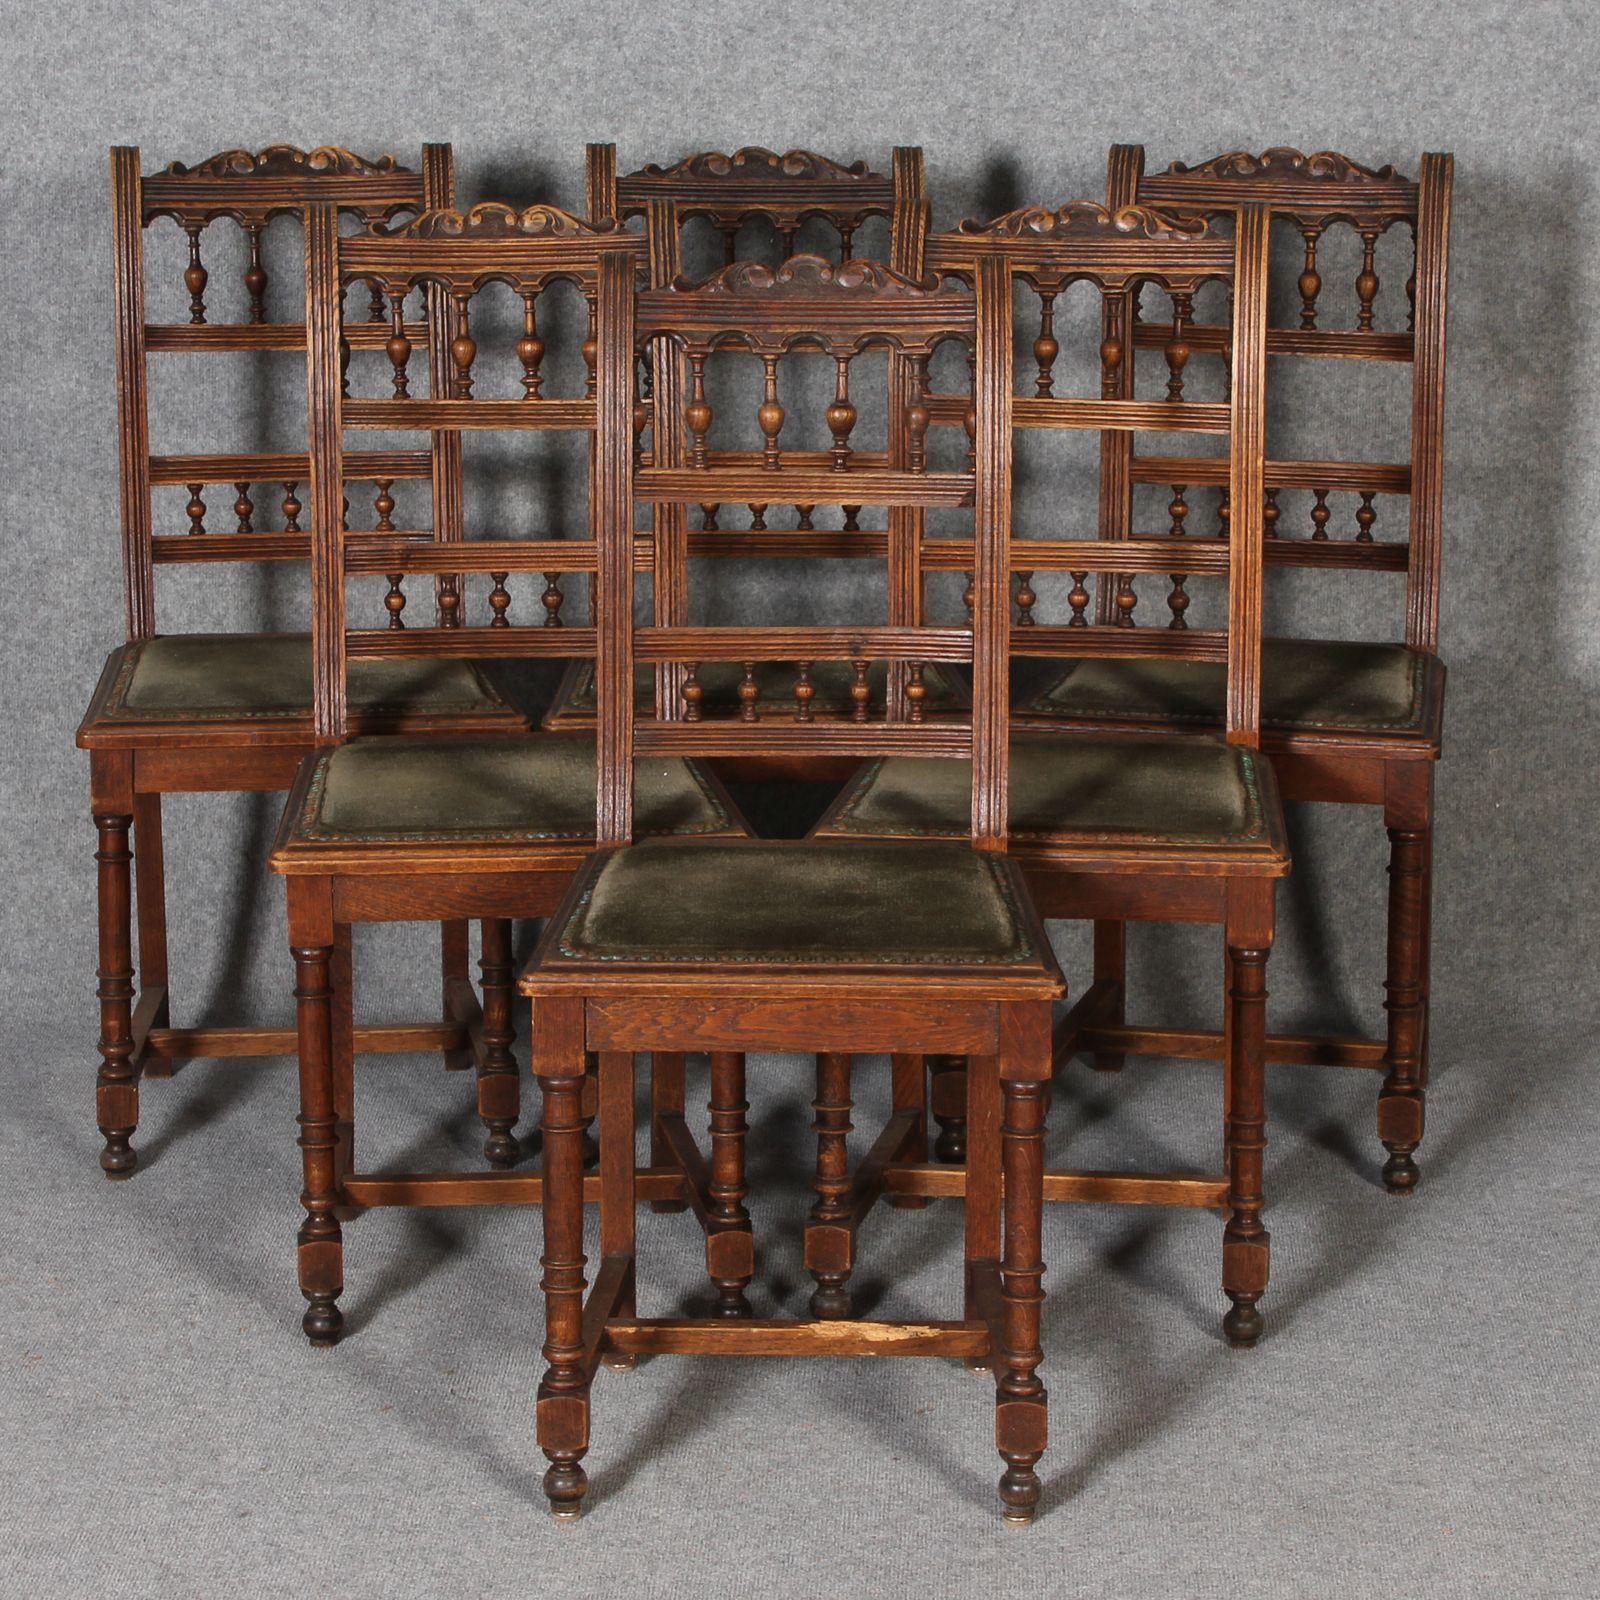 antike sitzm bel sofa stuhl sitzbank sessel kautsch barocksessel biedermeiersessel renaissance. Black Bedroom Furniture Sets. Home Design Ideas